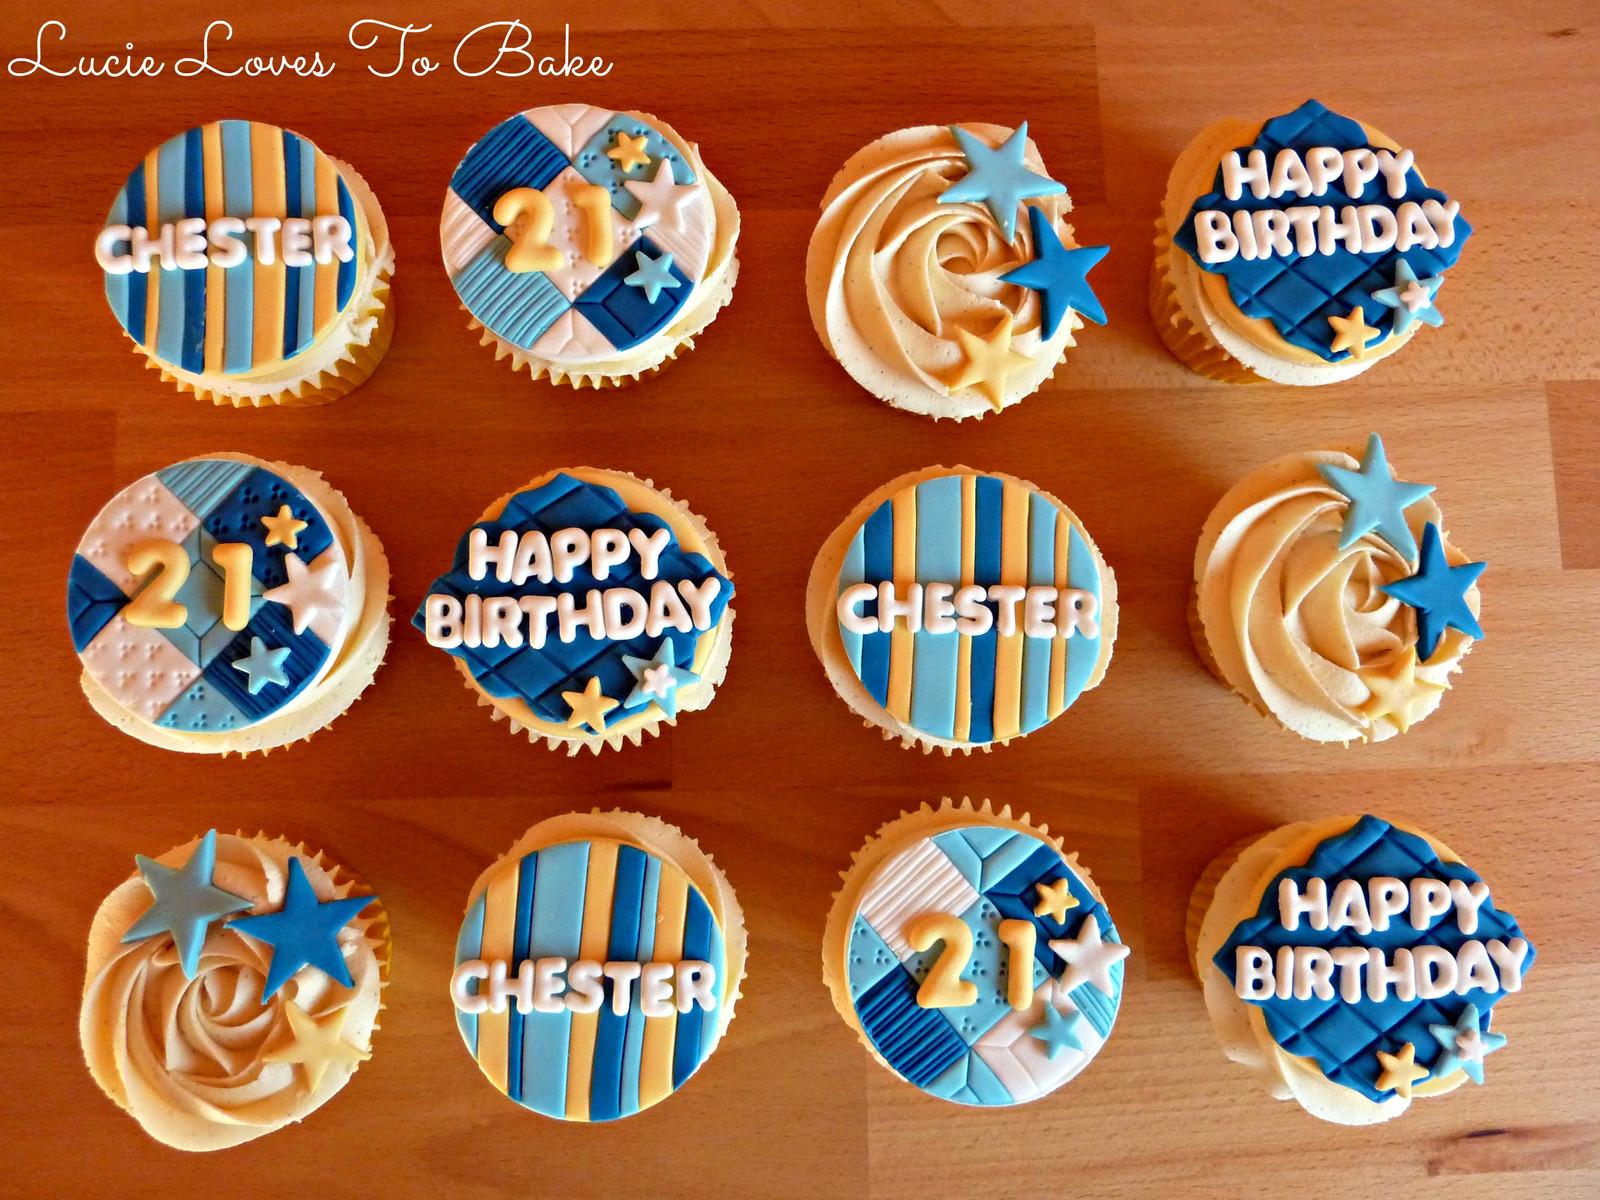 Male 21st Birthday Cupcakes